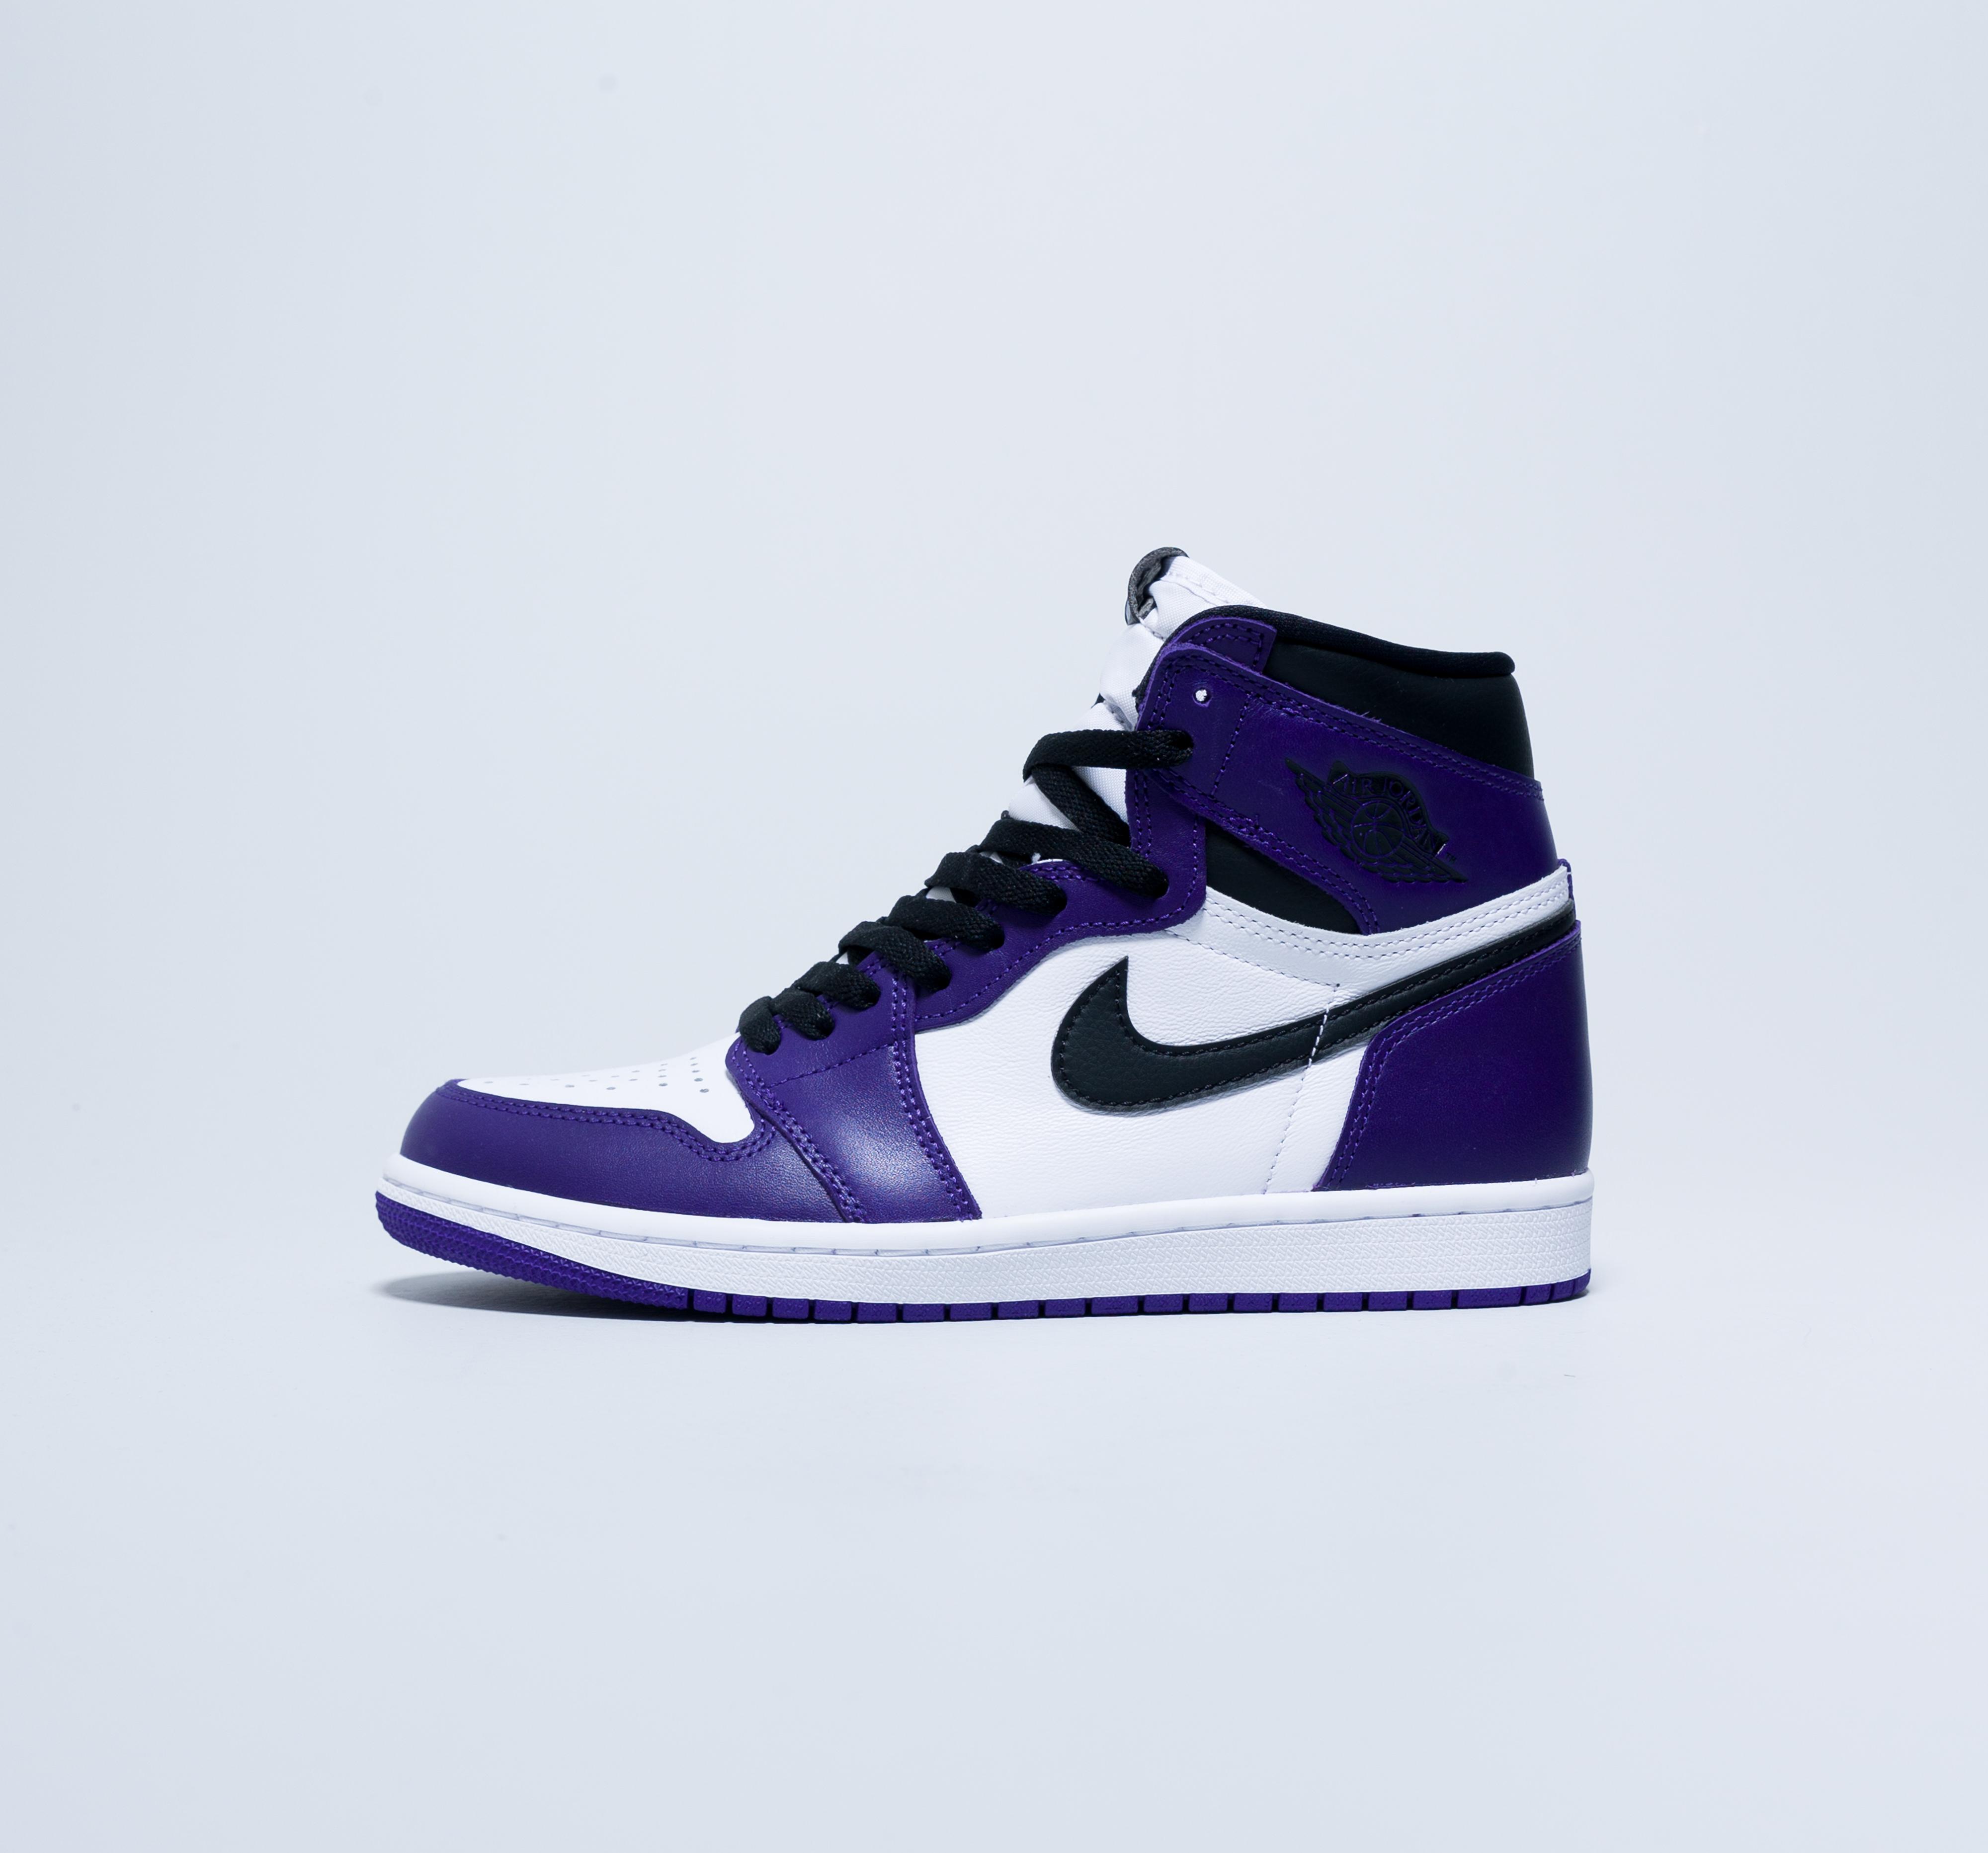 Jordan - Air Jordan 1 Retro High OG - Court Purple/Black-White - Up There